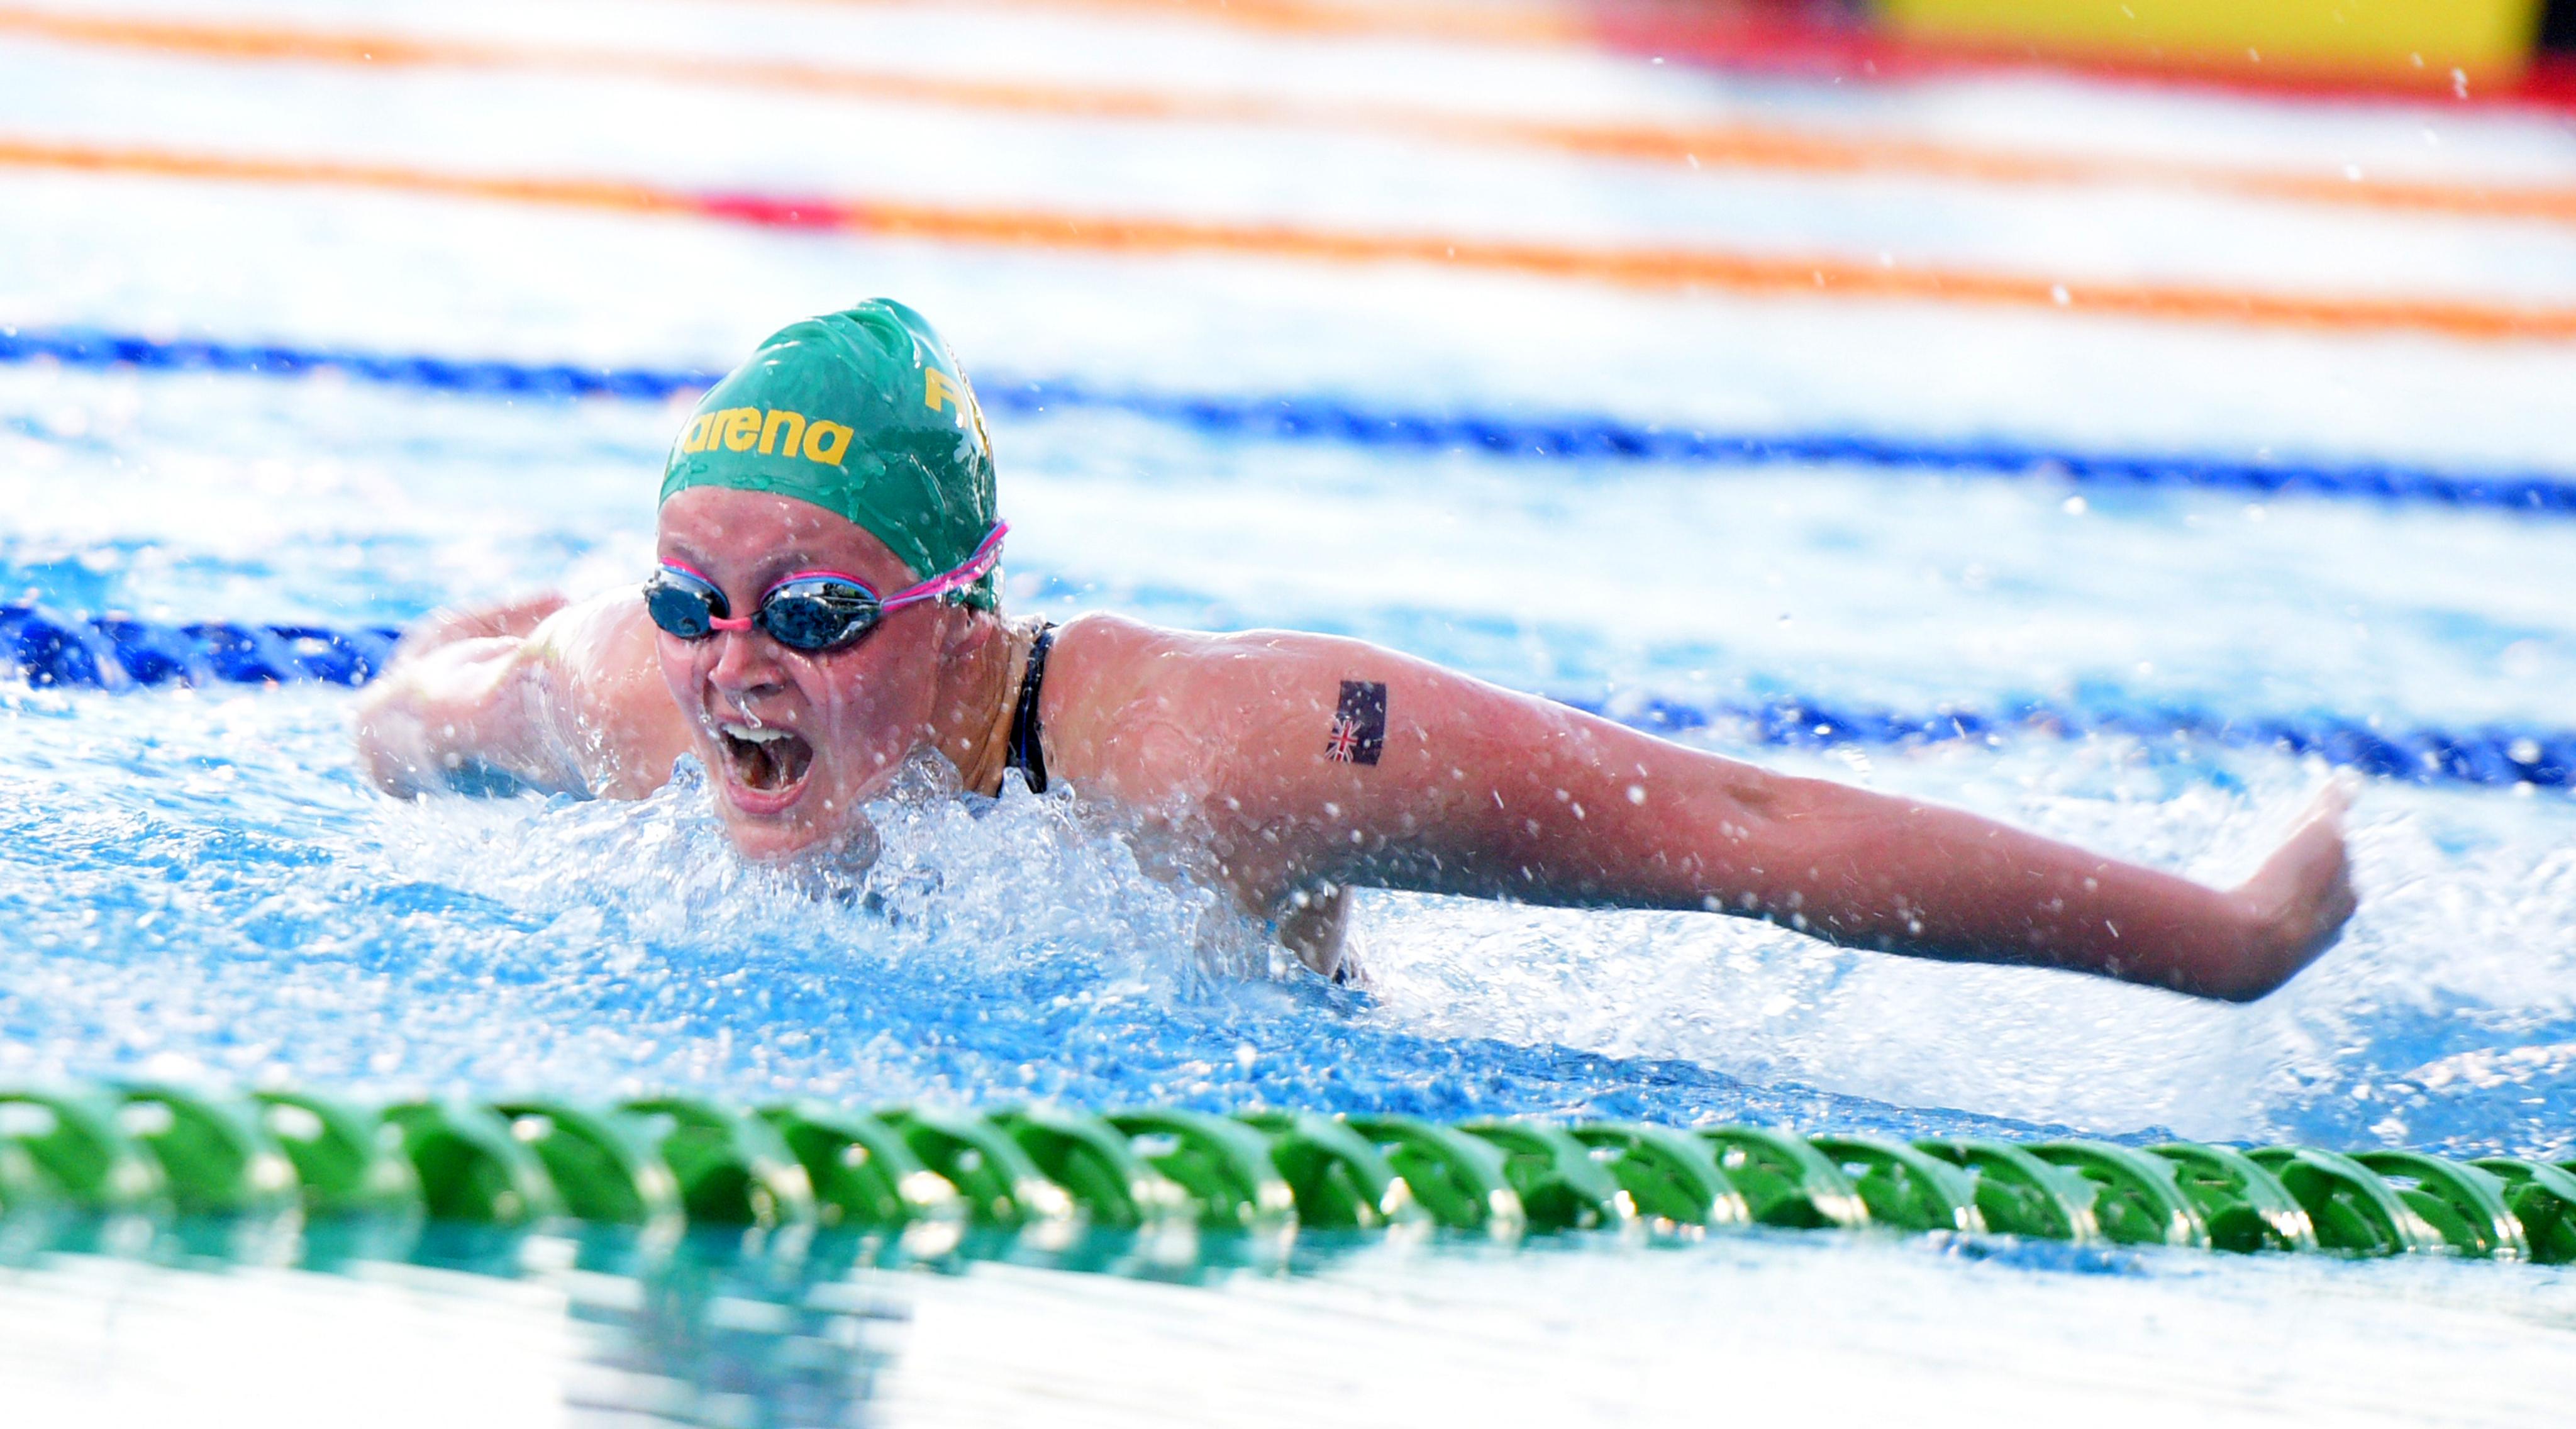 Jacinta Essam of Australia during the 2018 Junior Pan Pacific Swimming Championships women's 400m medley at Damodar Aquatic Centre on August 24, 2018. Photo: Ronald Kumar